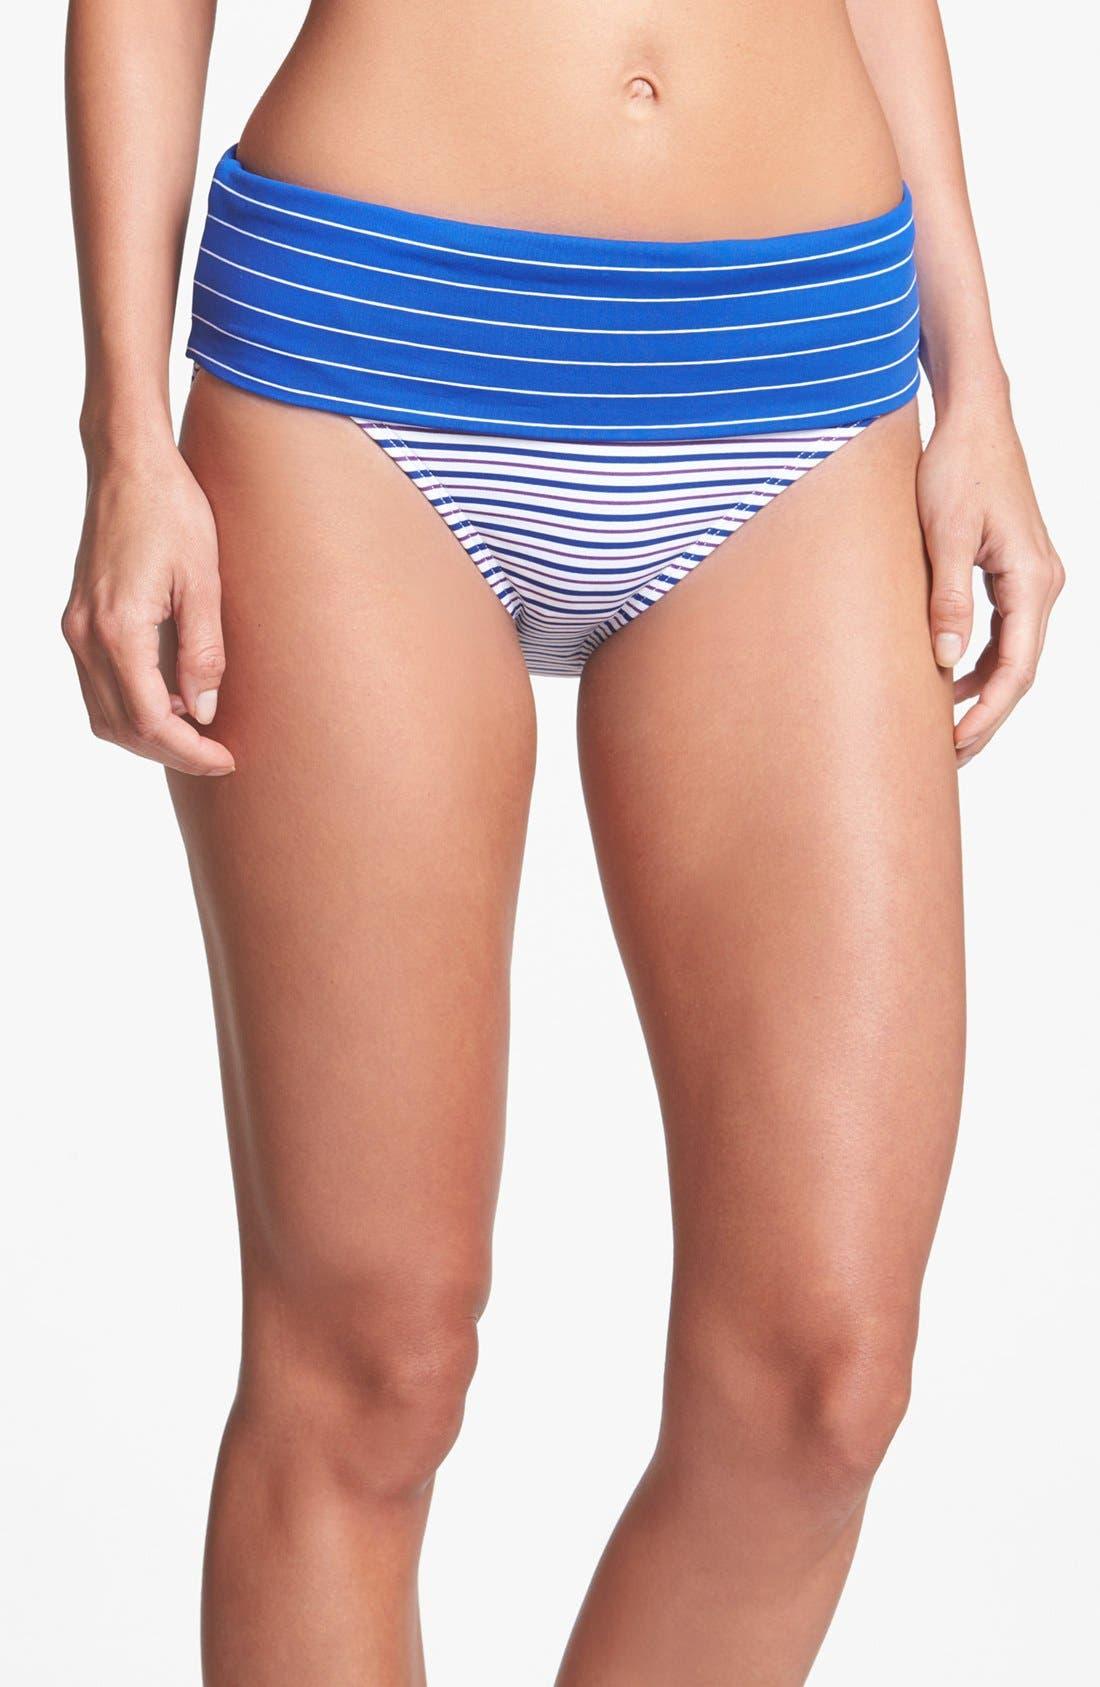 Alternate Image 1 Selected - Tommy Bahama 'Mingling' High Waist Bikini Bottoms